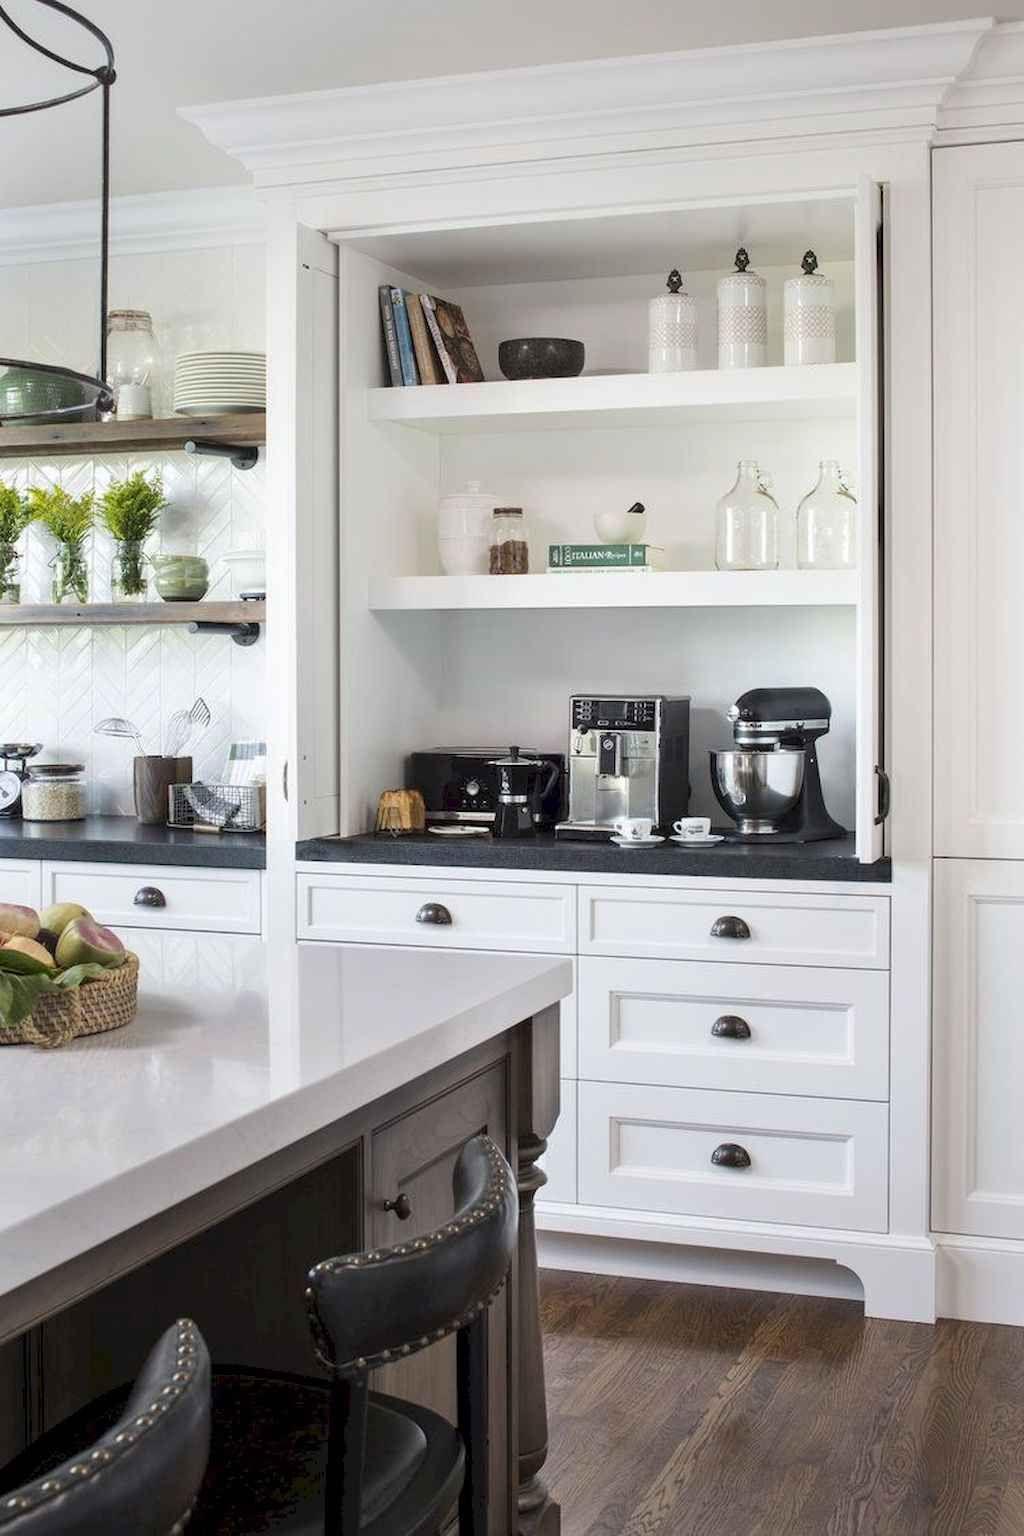 65 White Kitchen Cabinet Decor Ideas images